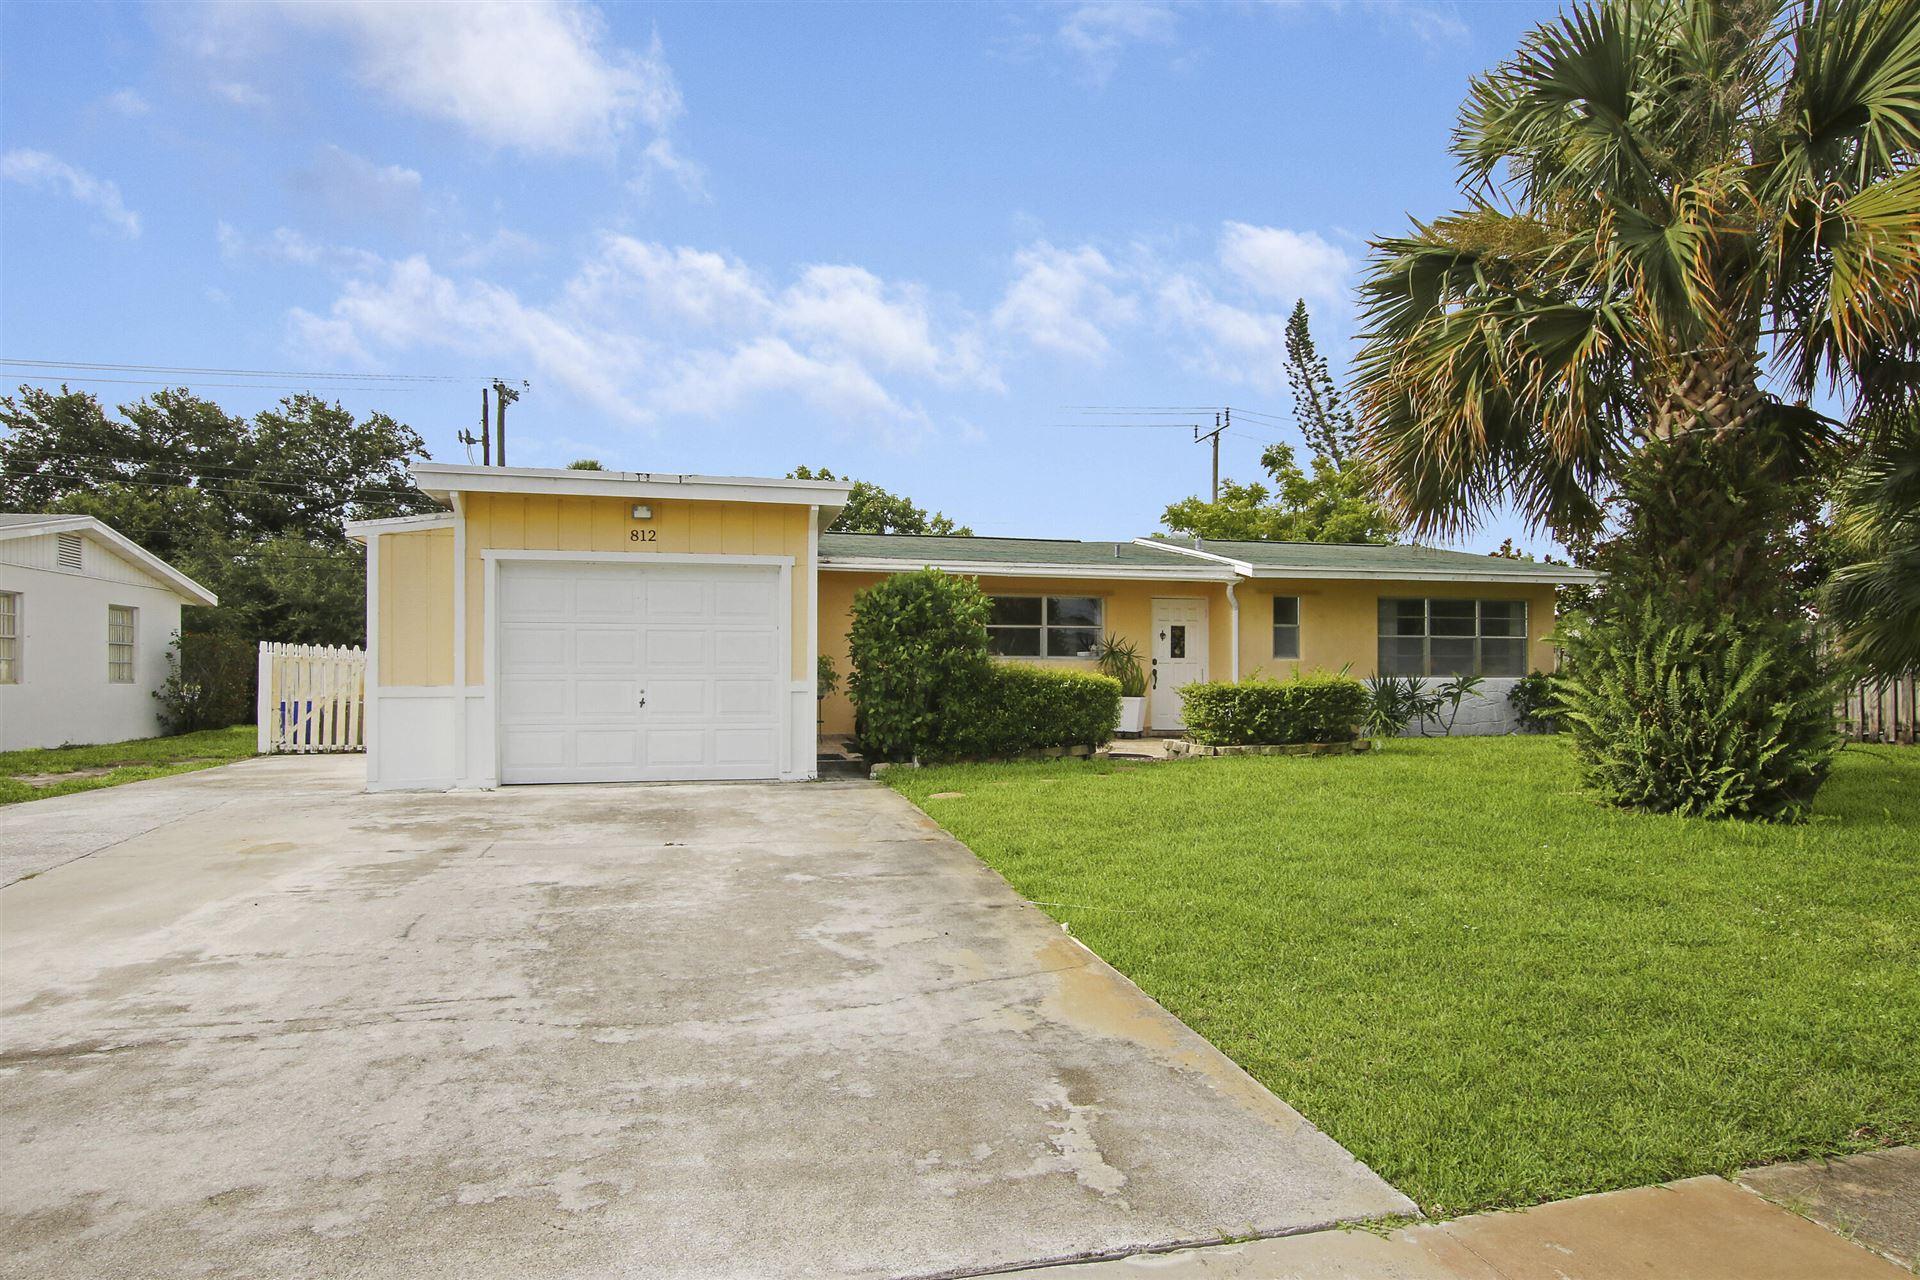 Photo of 812 Dogwood Road, North Palm Beach, FL 33408 (MLS # RX-10724294)